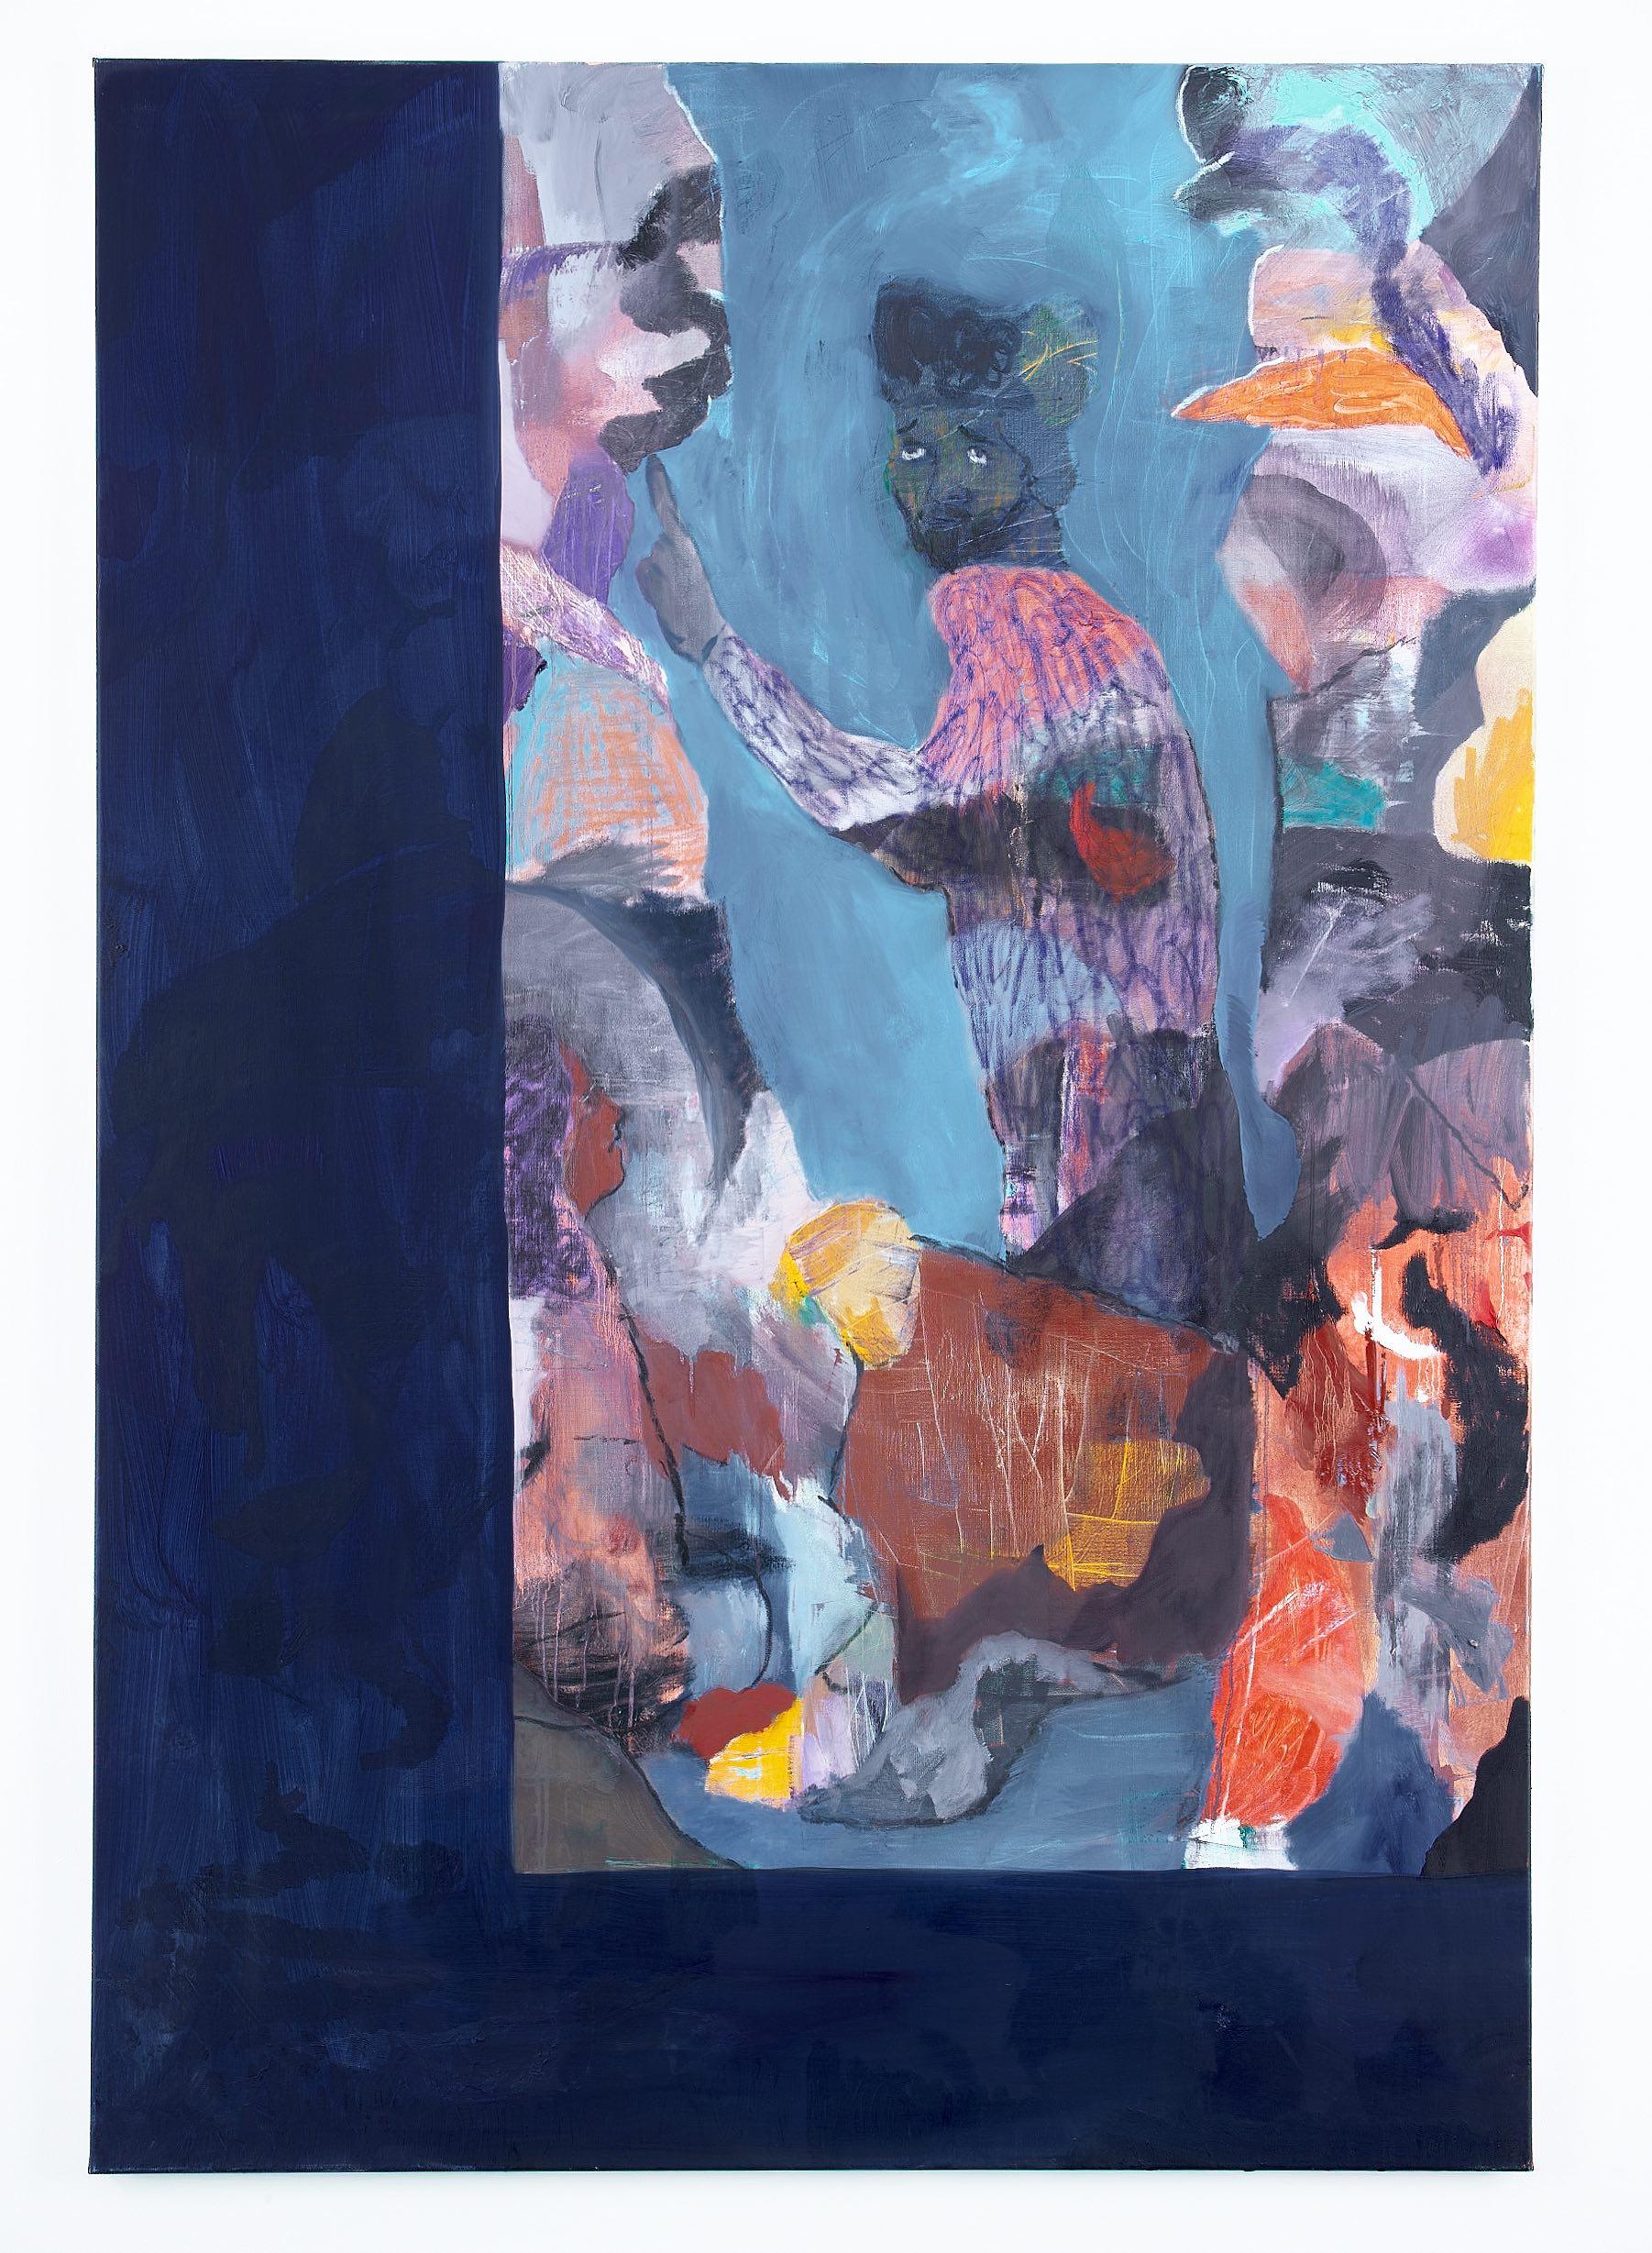 Tom Anholt, Lost Girl, 2016